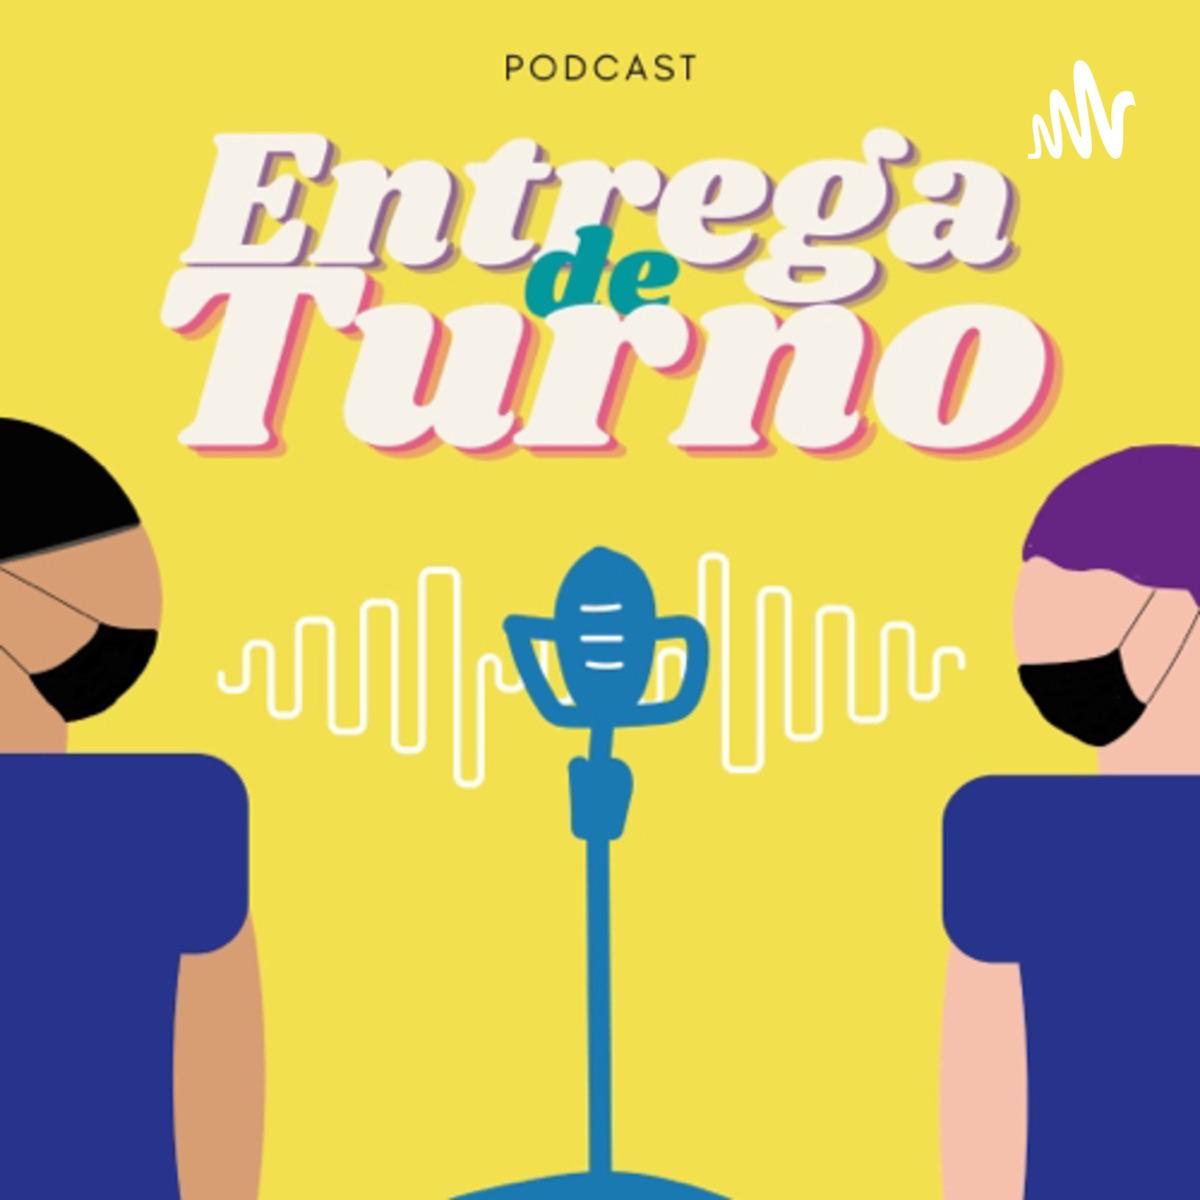 Entrega de Turno Podcast